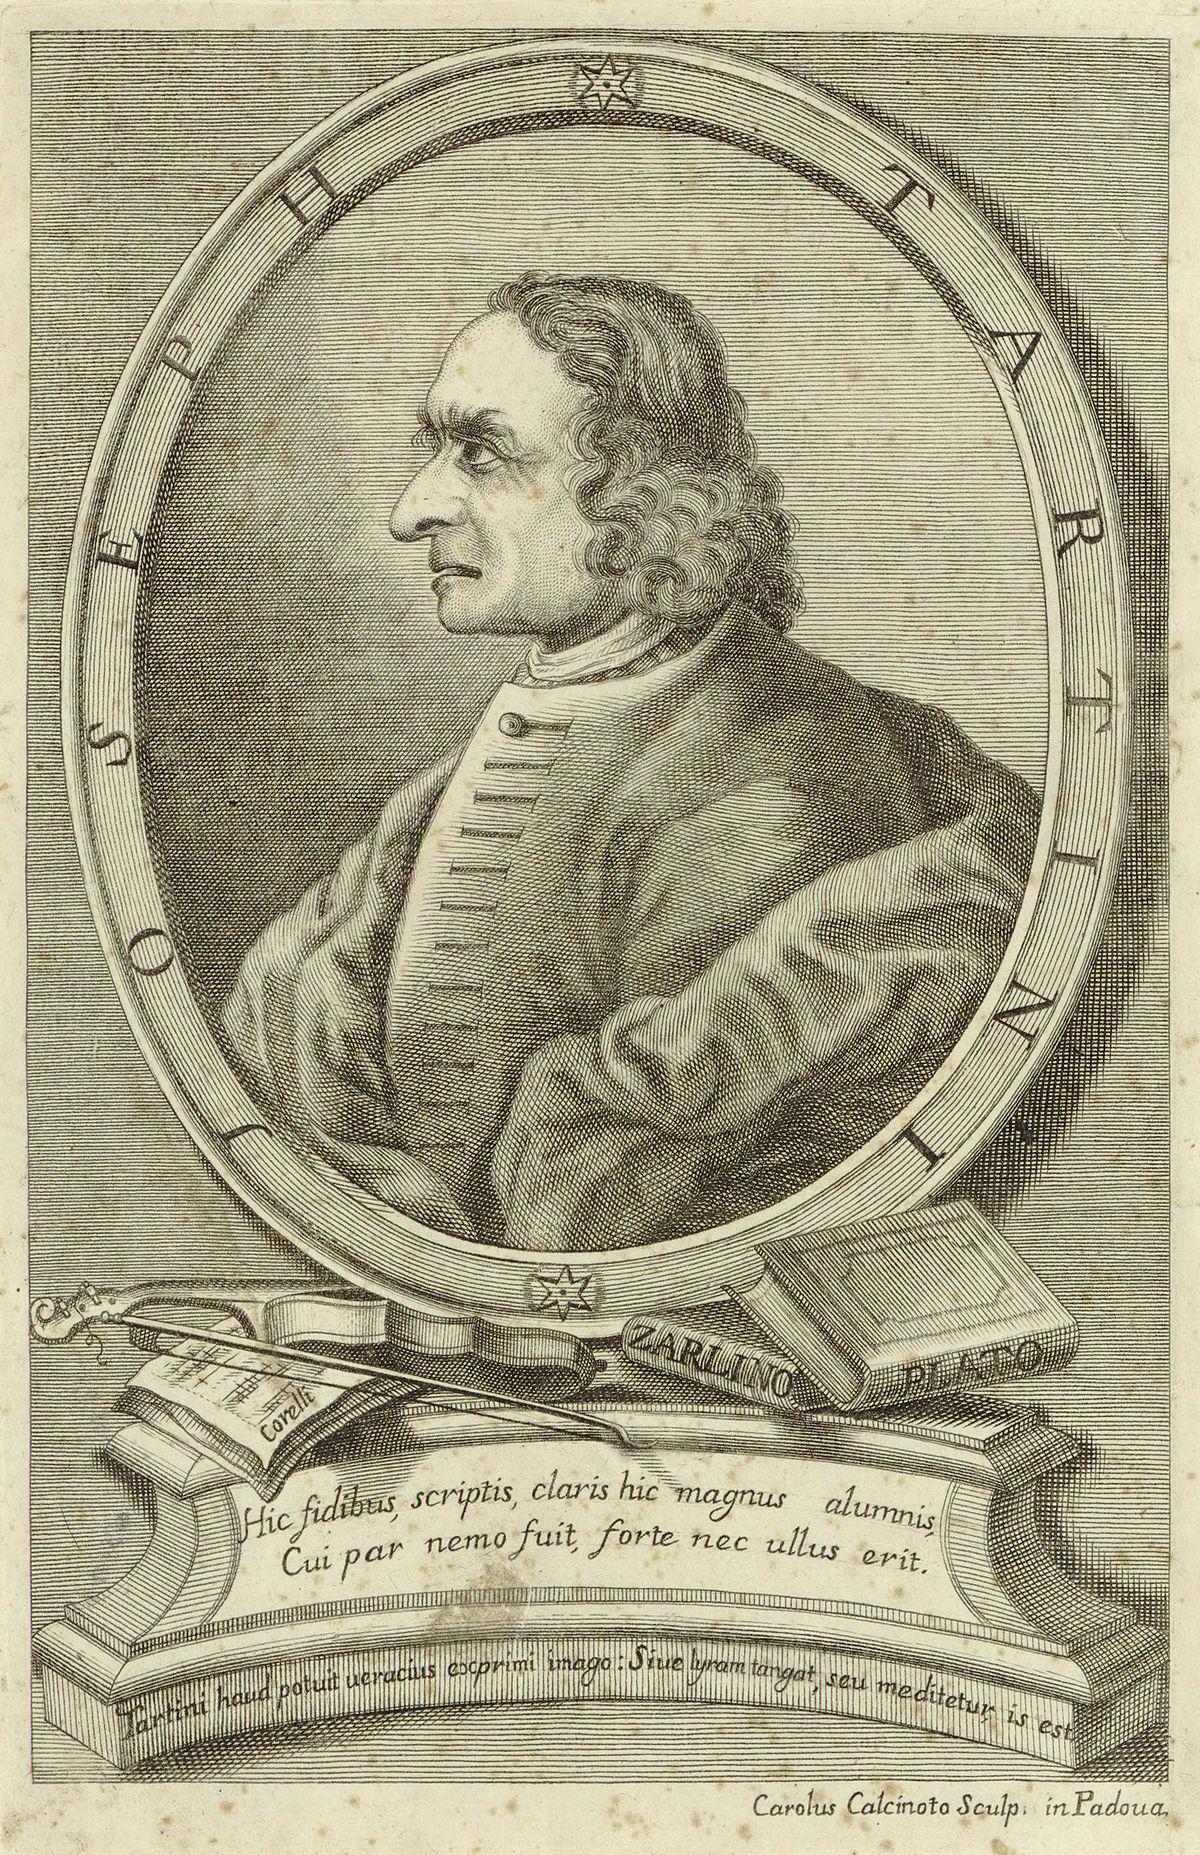 https://upload.wikimedia.org/wikipedia/commons/thumb/8/8a/Giuseppe_Tartini.jpg/1200px-Giuseppe_Tartini.jpg